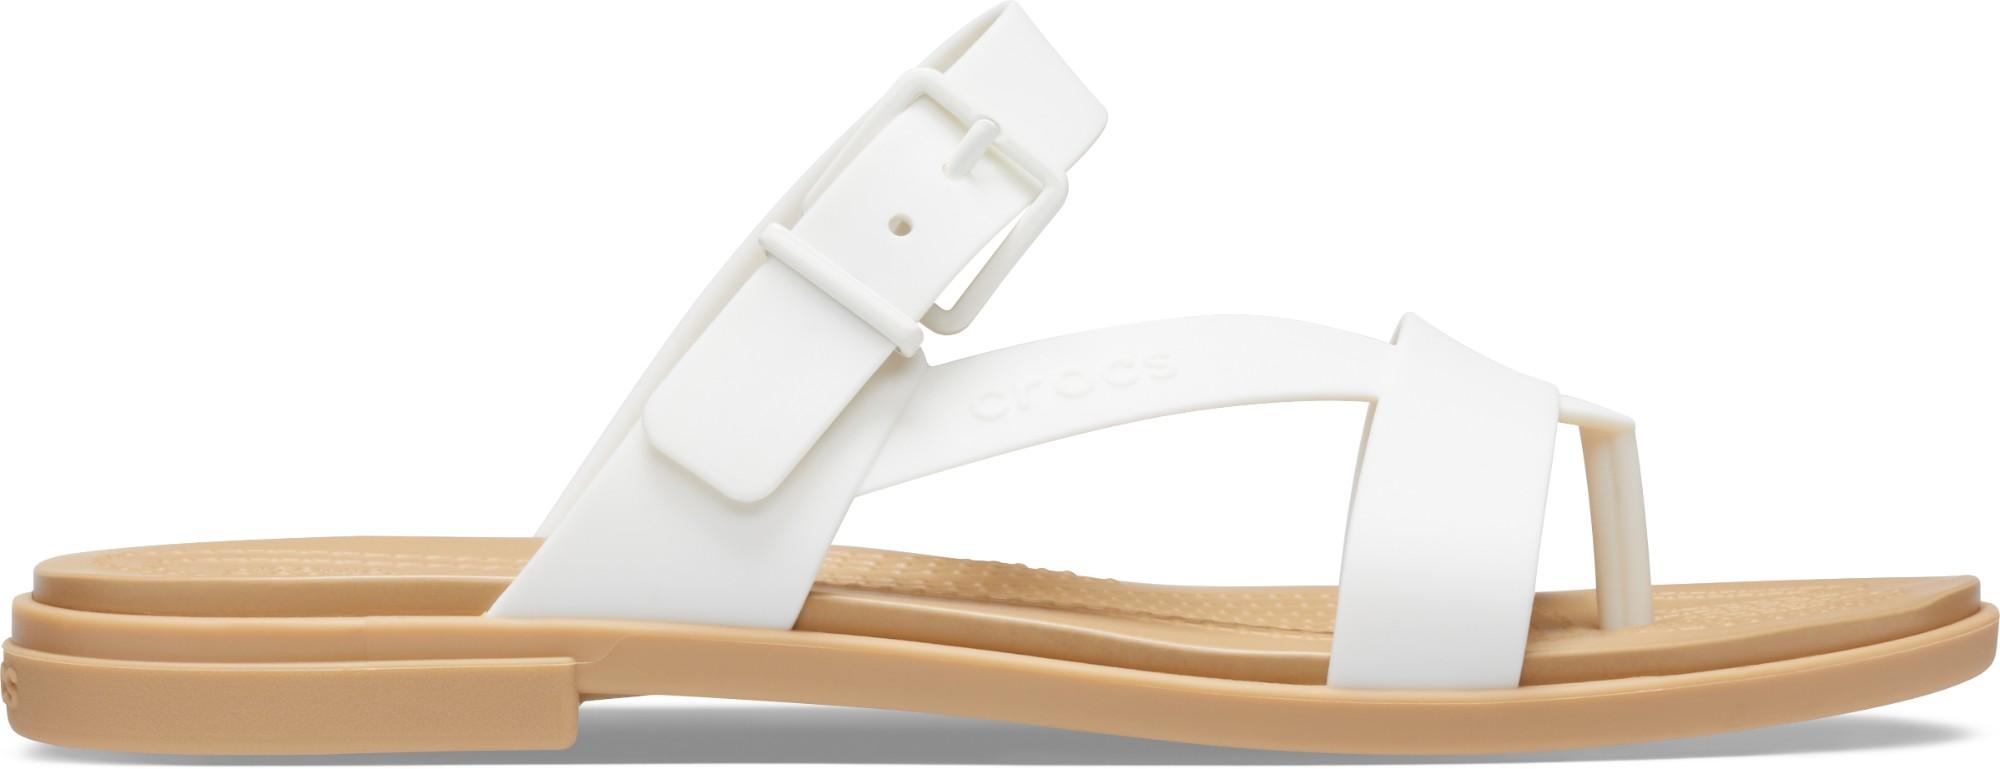 Crocs™ Tulum Toe Post Sandal Womens Oyster/Tan 39,5